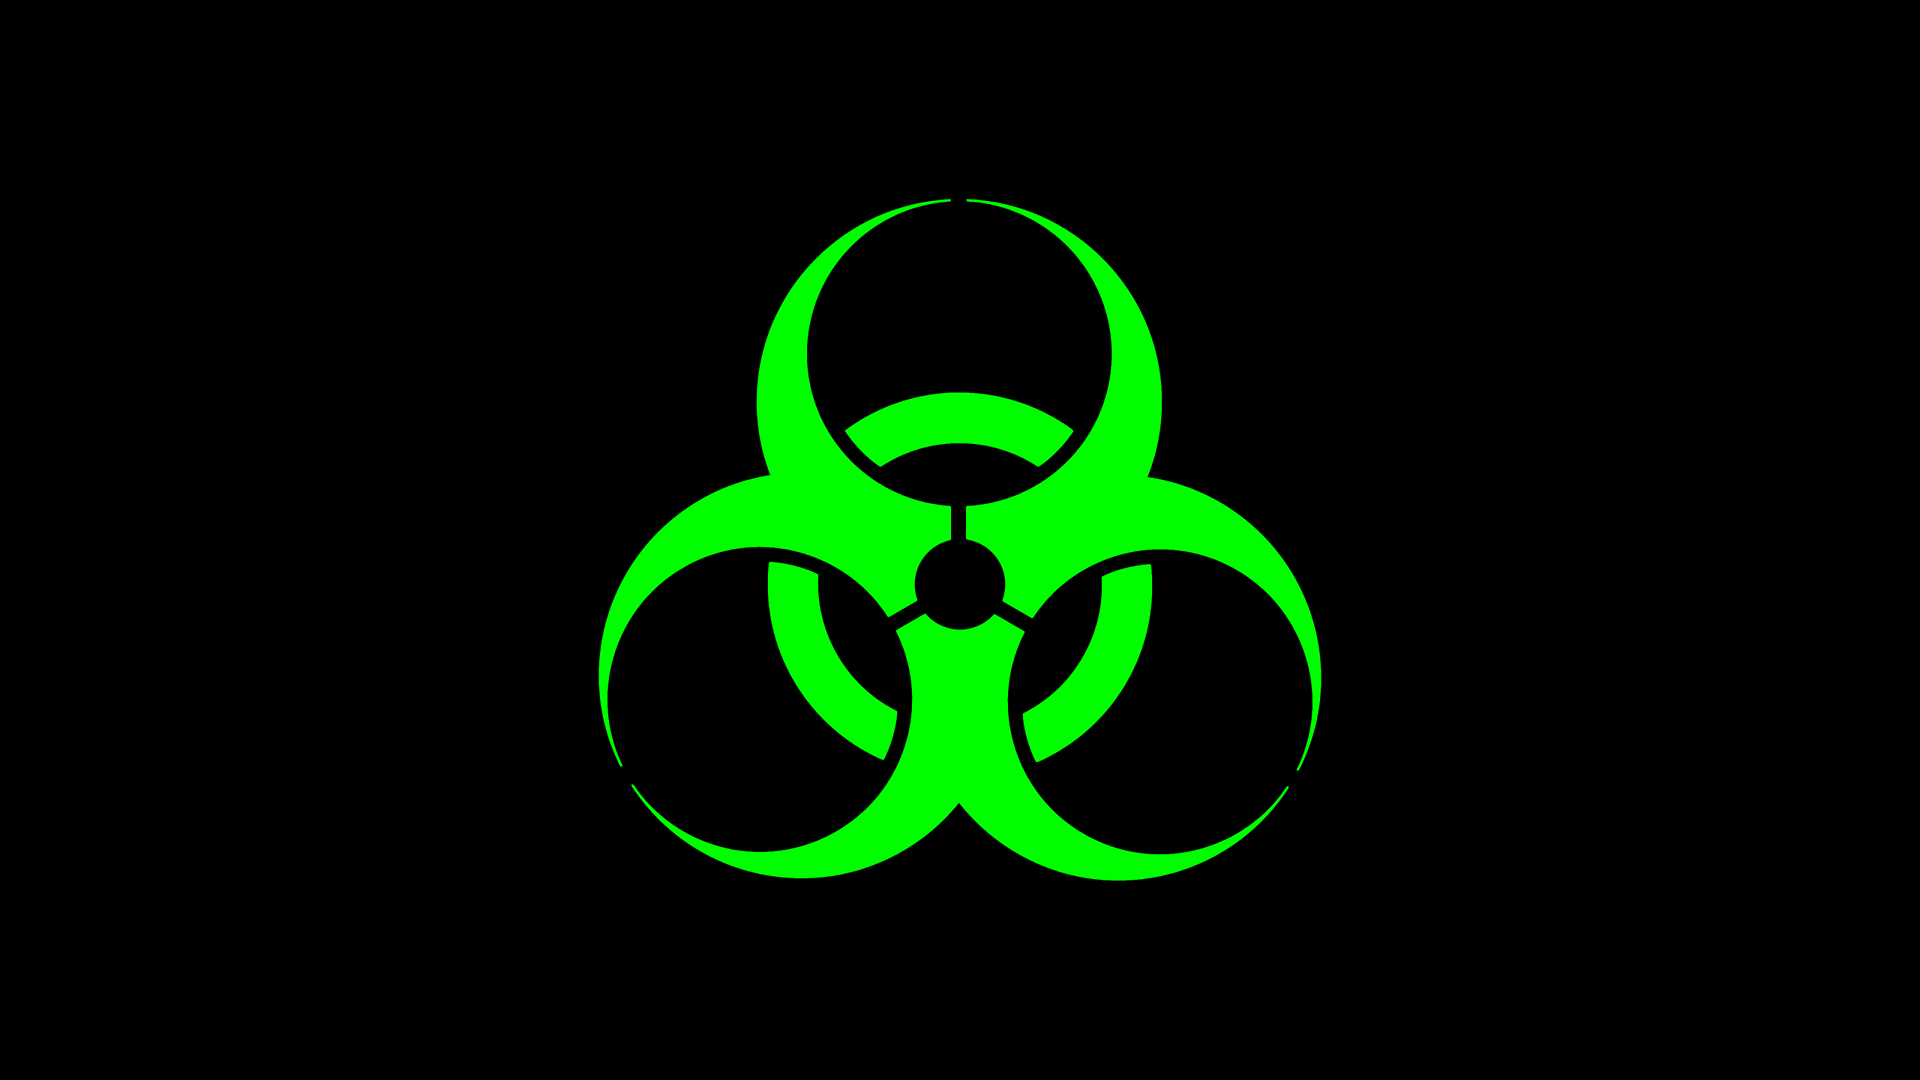 Hd wallpaper png - Hd Wallpaper Png Biohazard 3d Wallpapers Pictures Hd Wallpapers